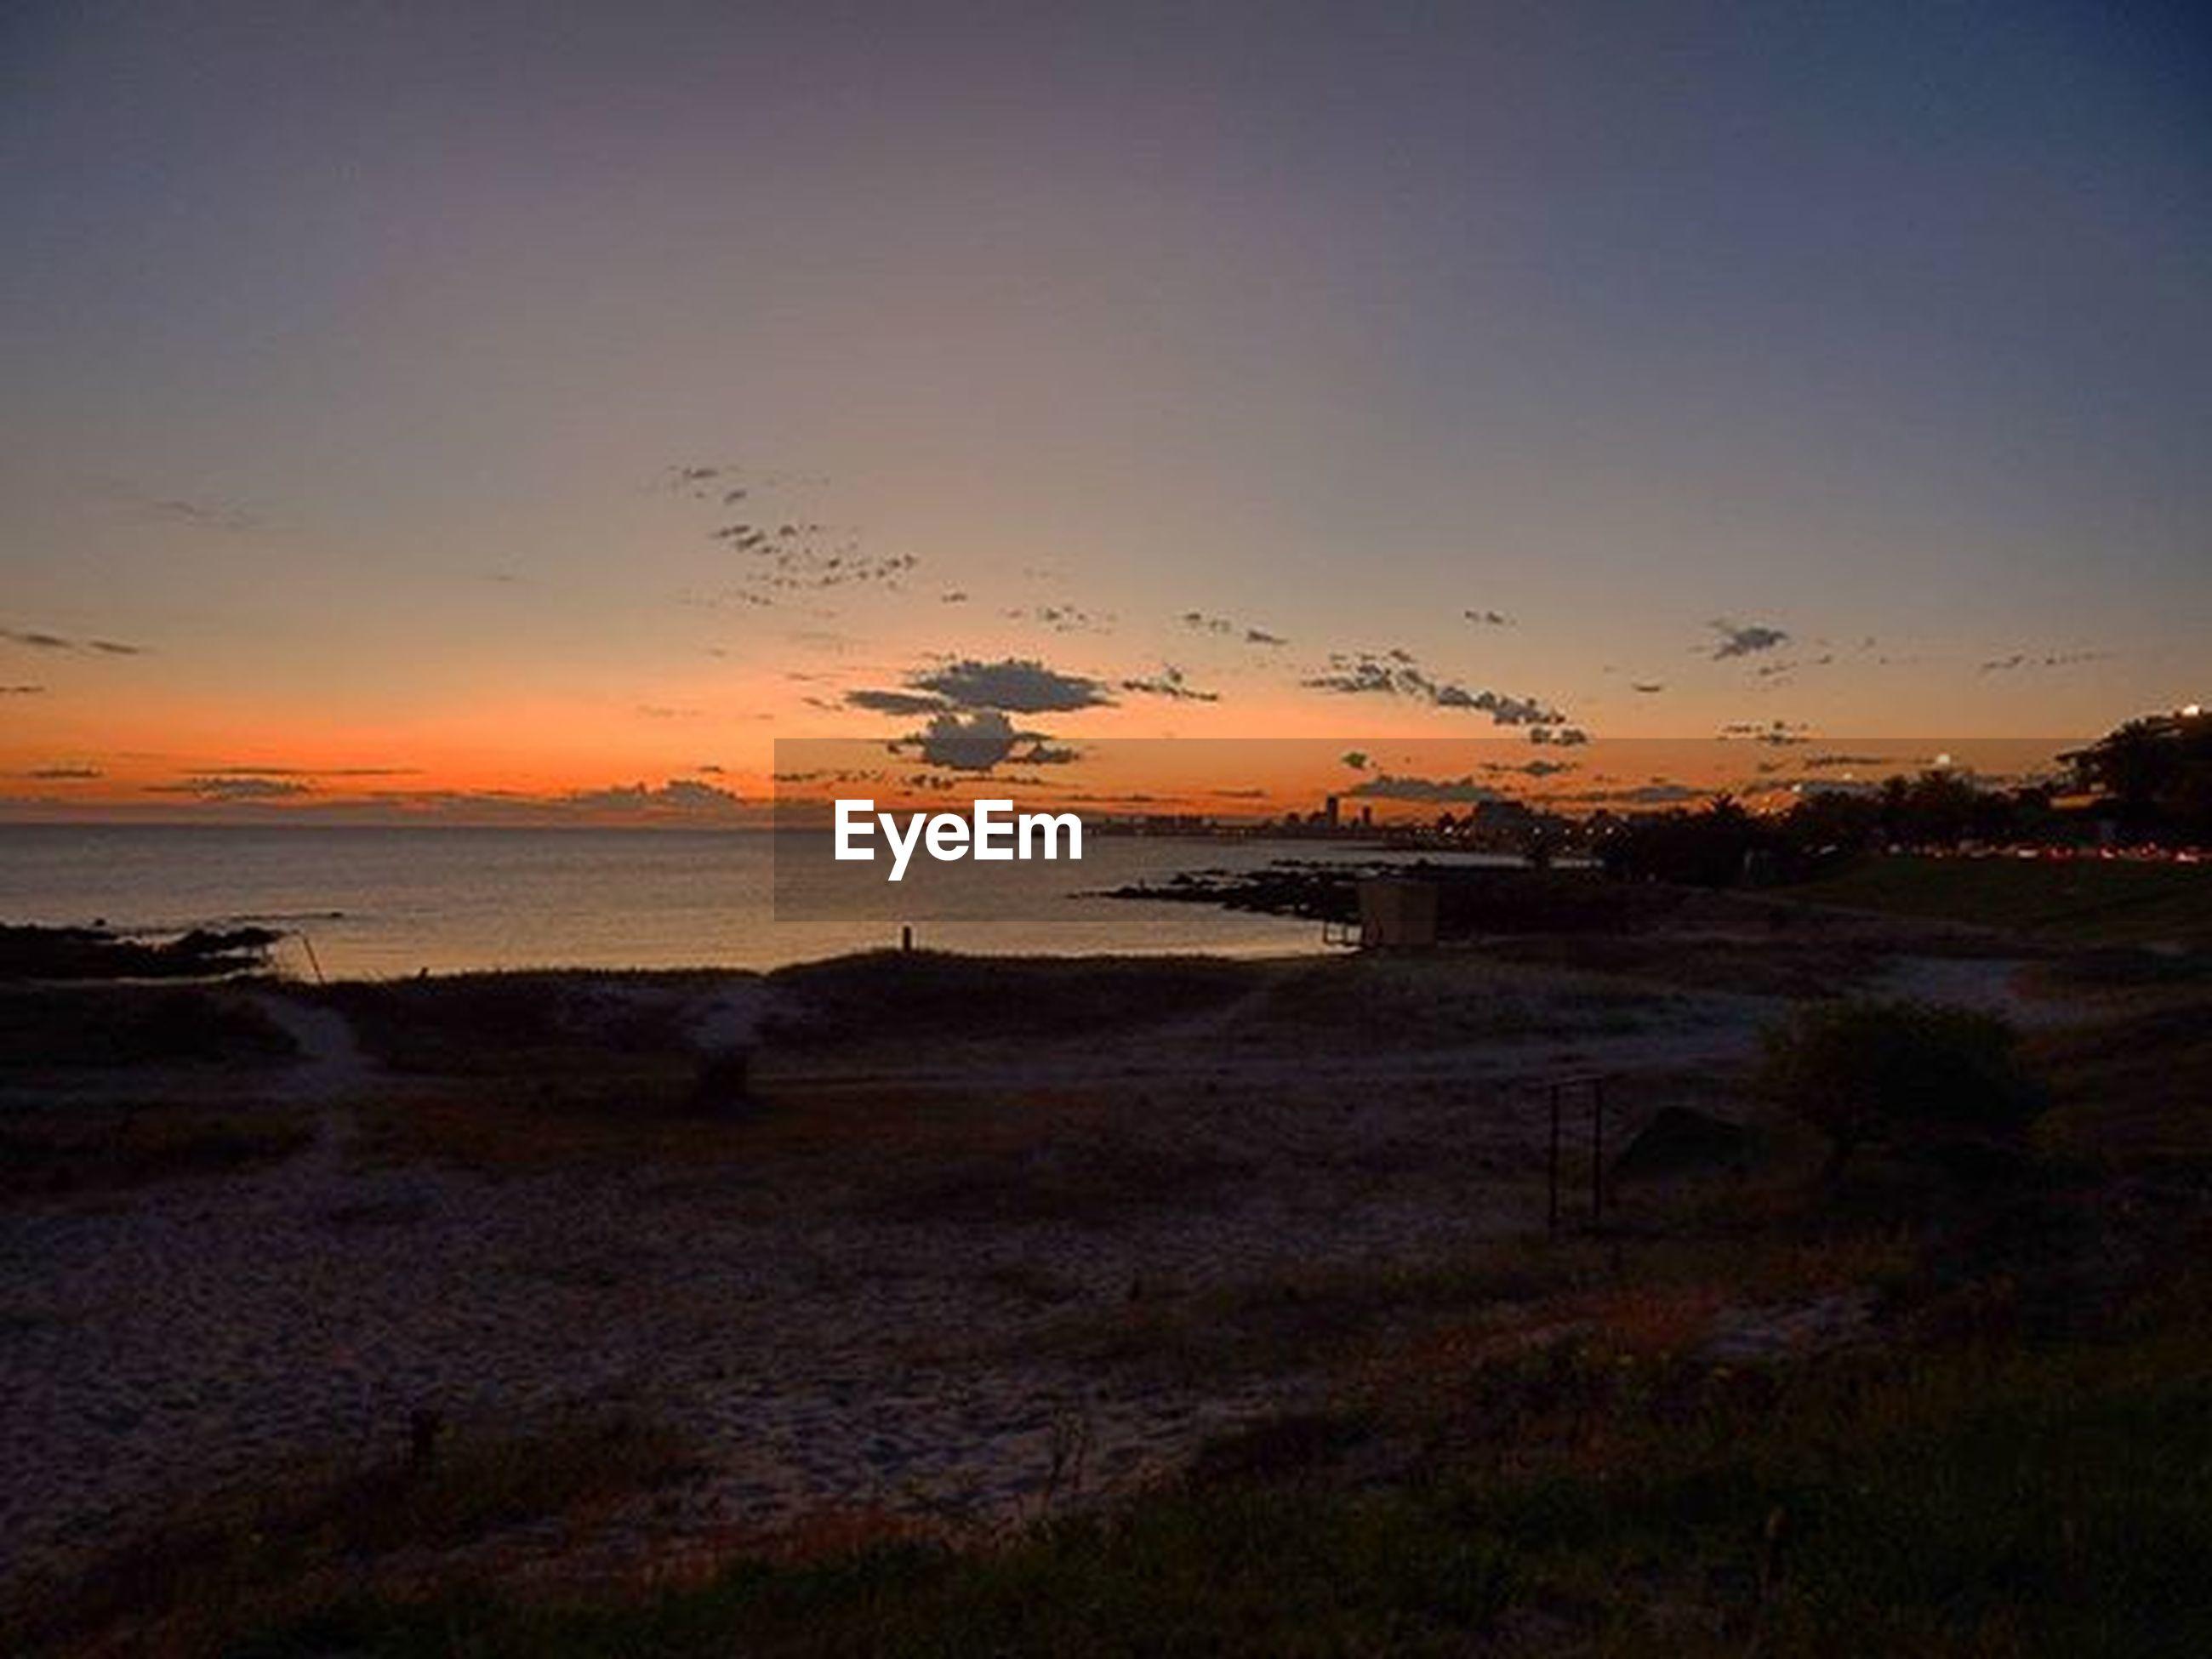 sunset, tranquil scene, scenics, tranquility, sea, water, beauty in nature, beach, sky, orange color, horizon over water, silhouette, nature, idyllic, shore, landscape, non-urban scene, dusk, sand, remote